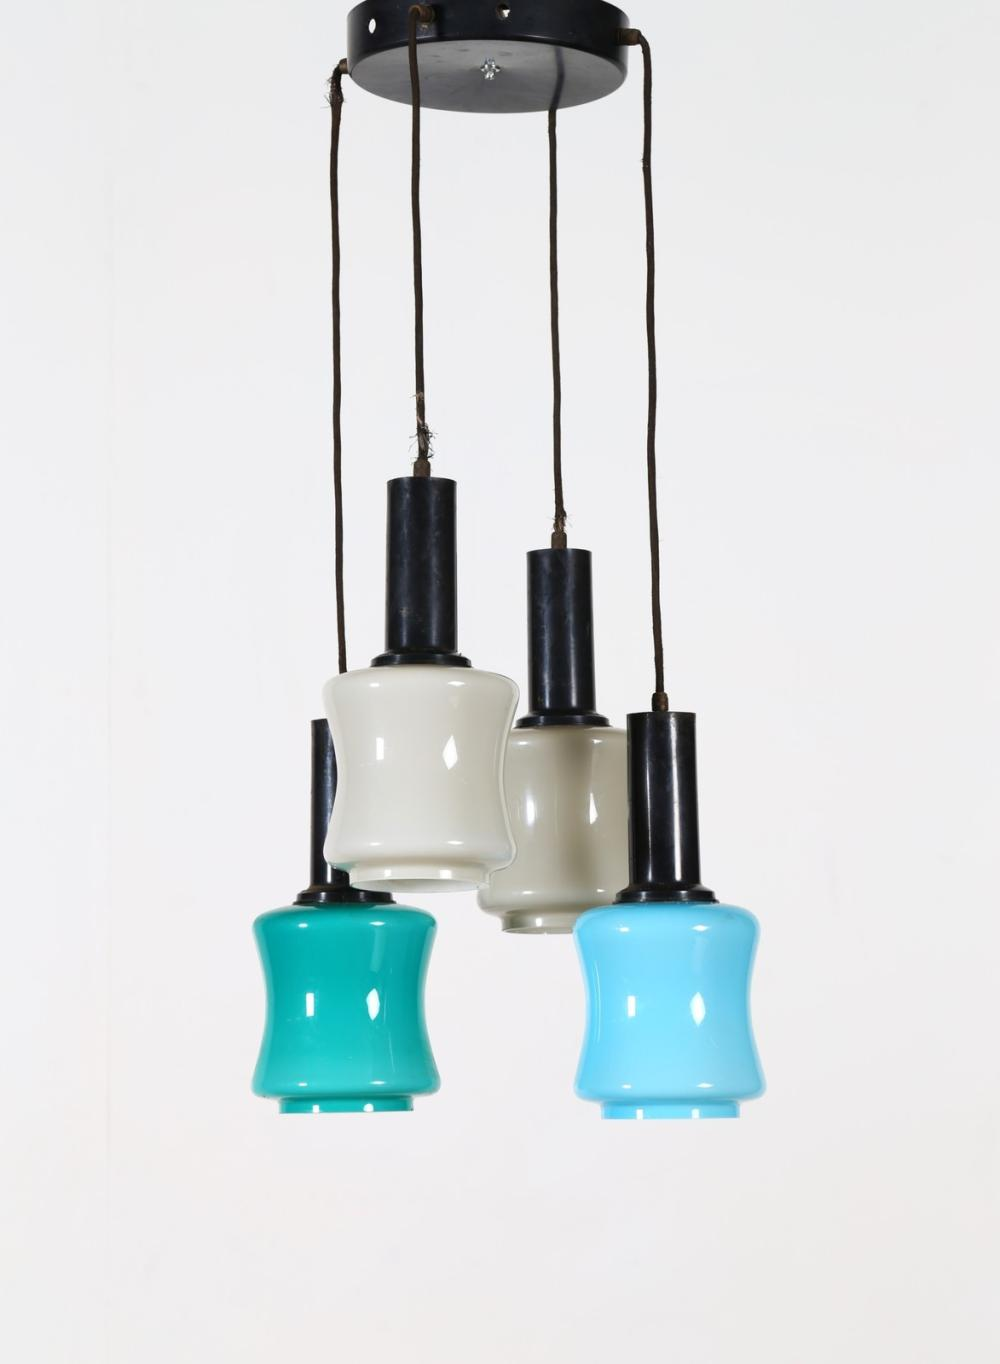 VISTOSI GINO (1925 - 1980) Four lights chandelier